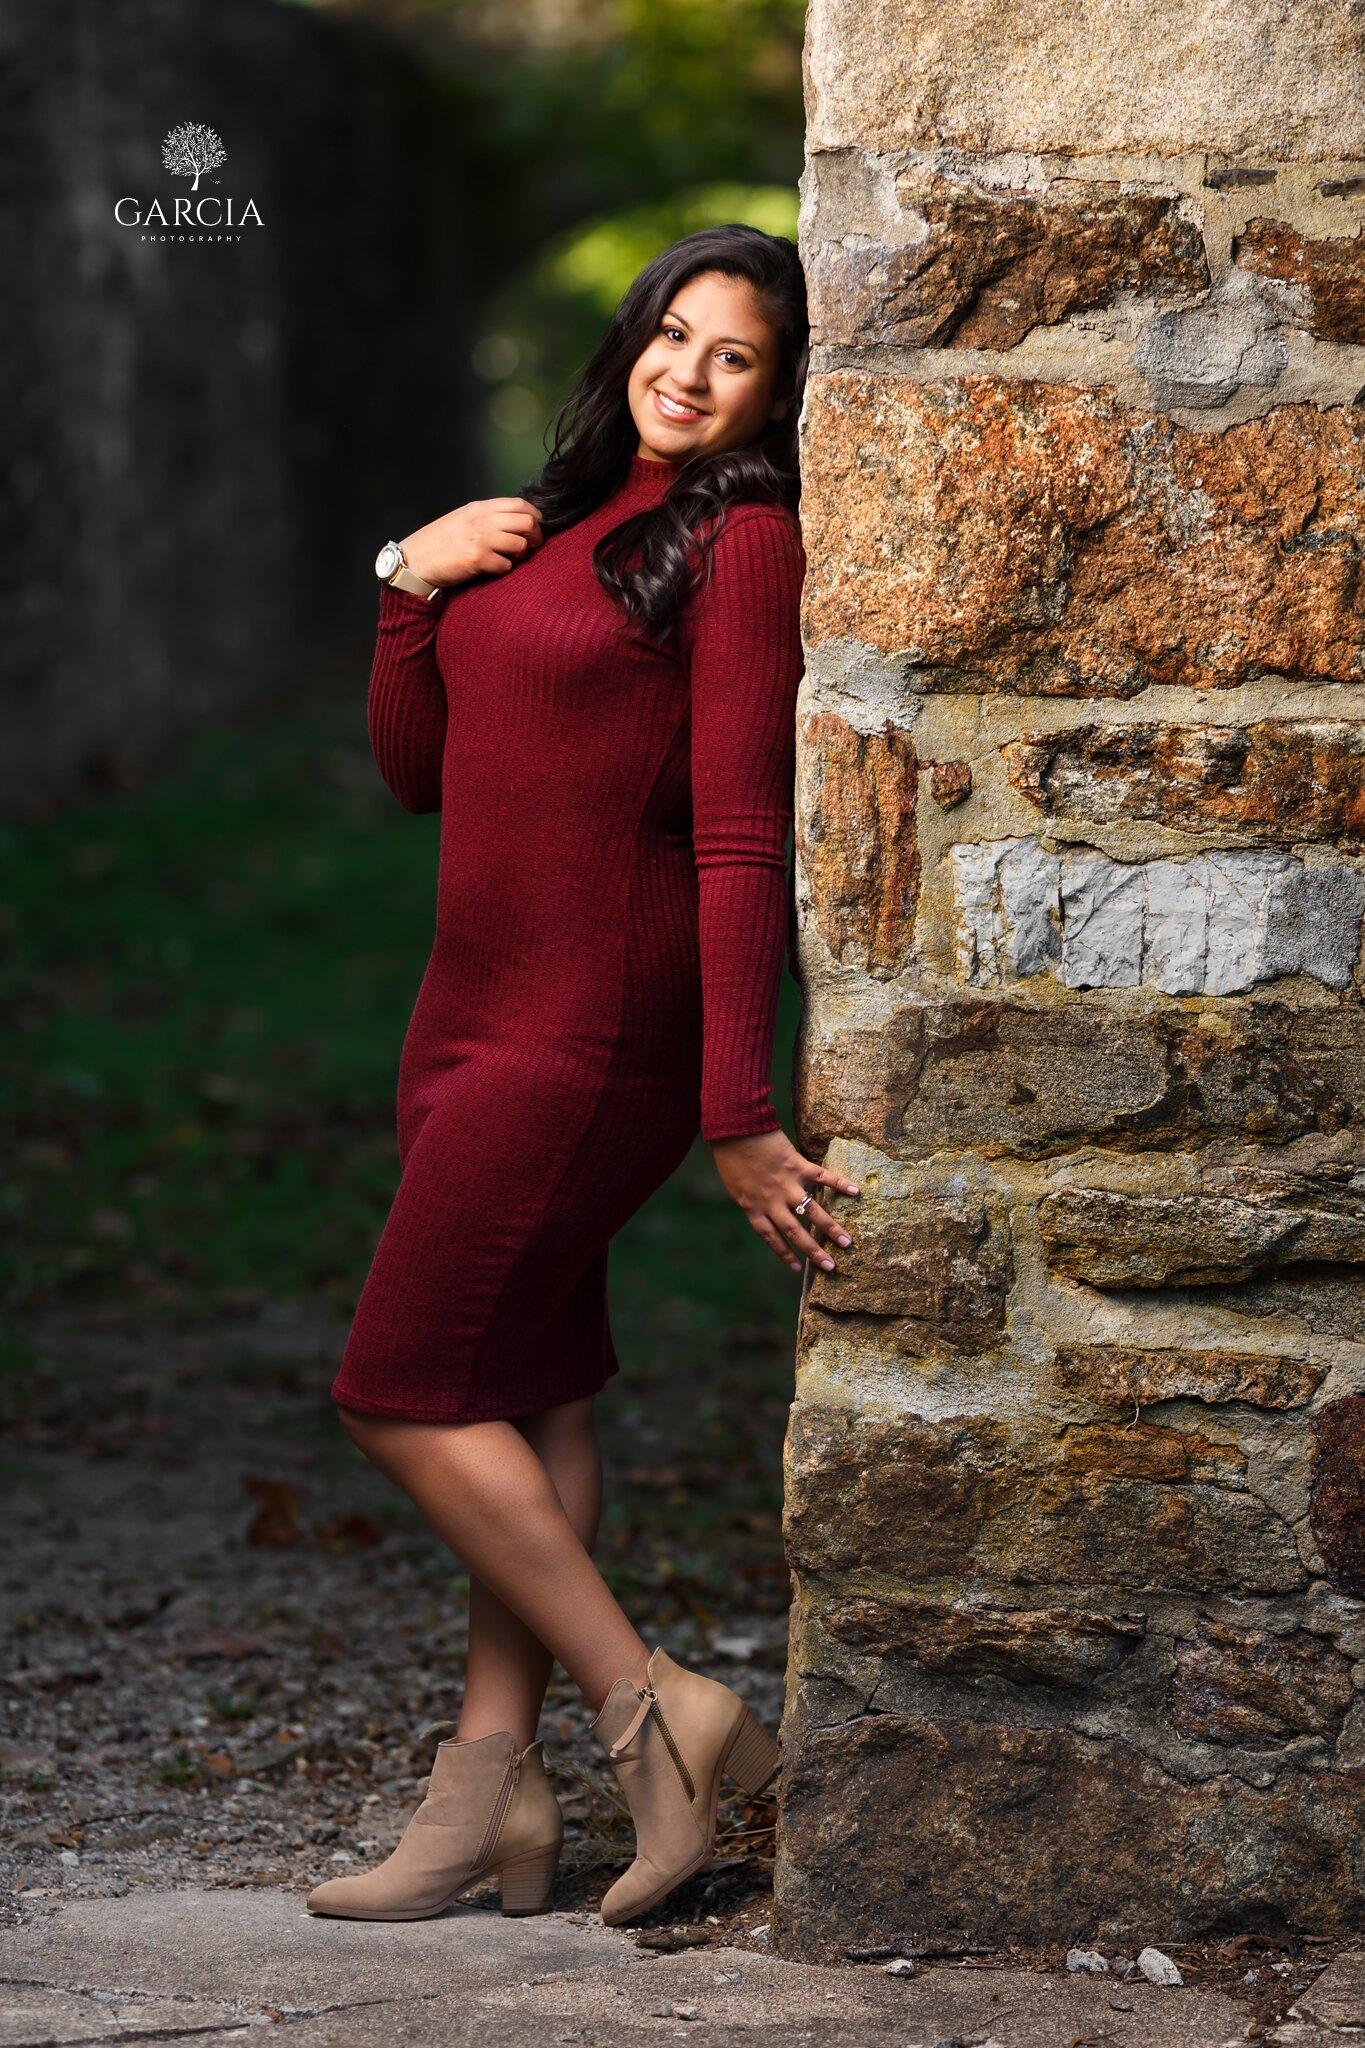 Serena-Layla-Jazlynne-Garcia-Photography-6806.jpg